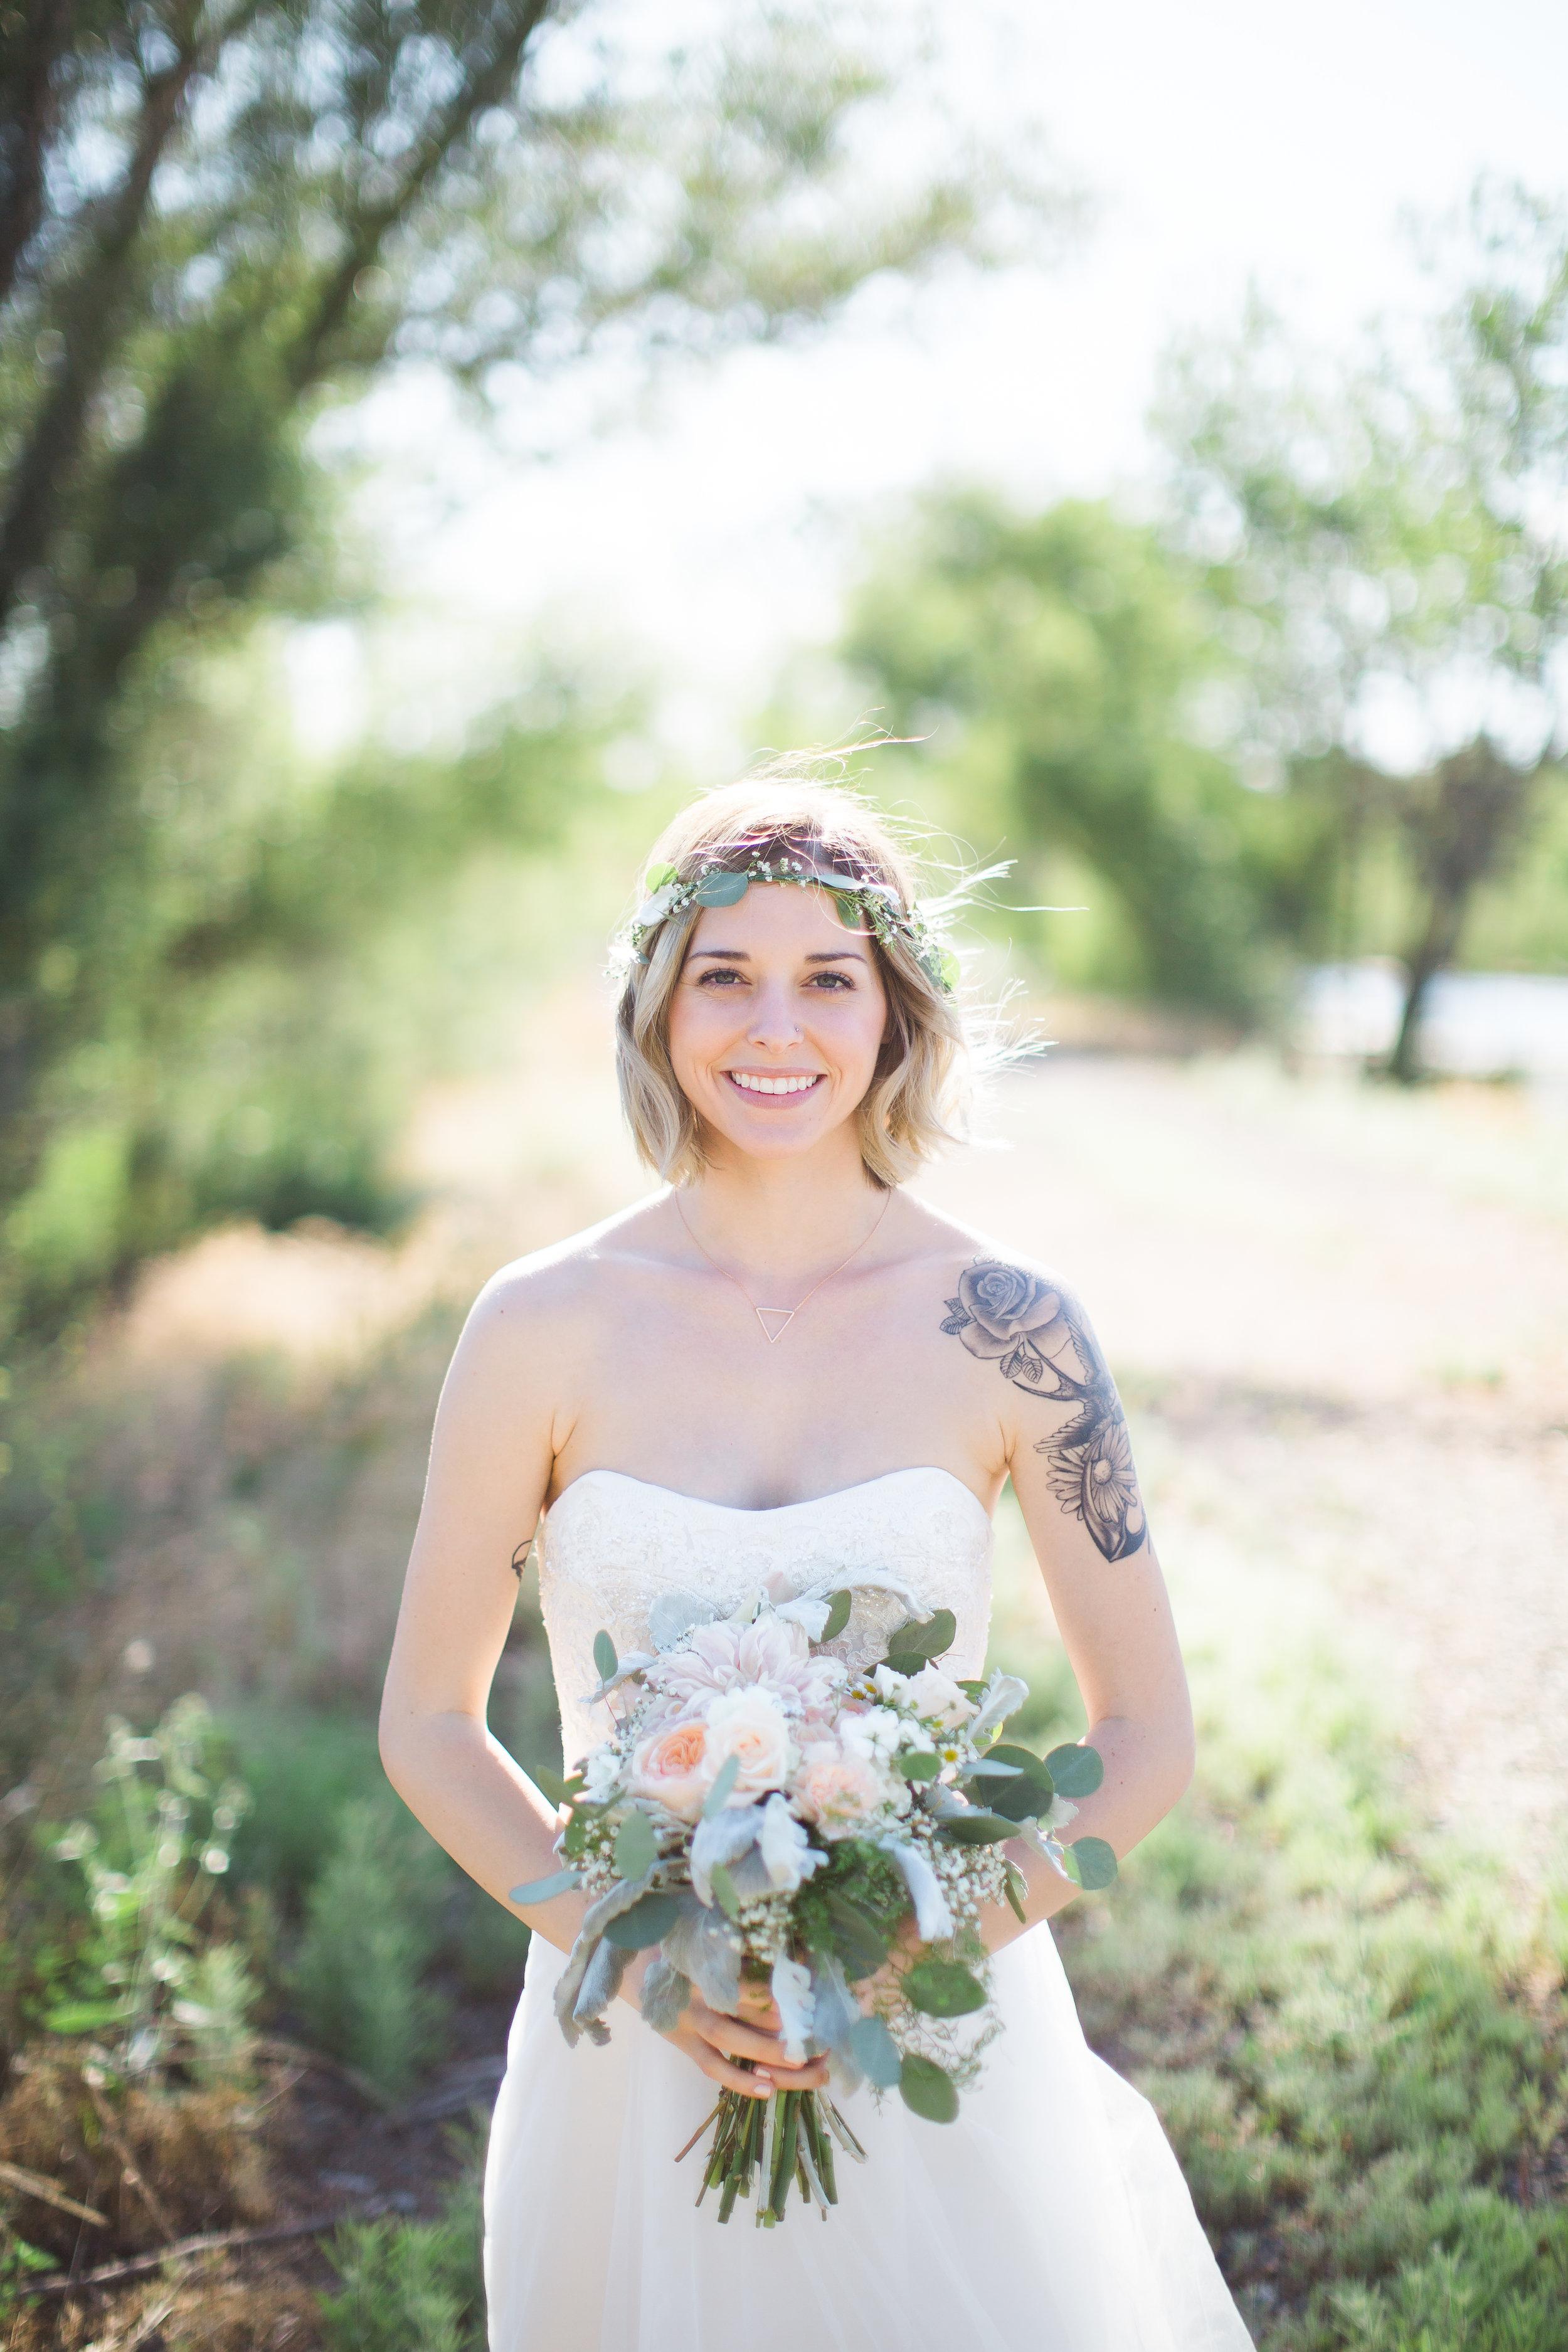 clayton+kennedy-married-430.jpg